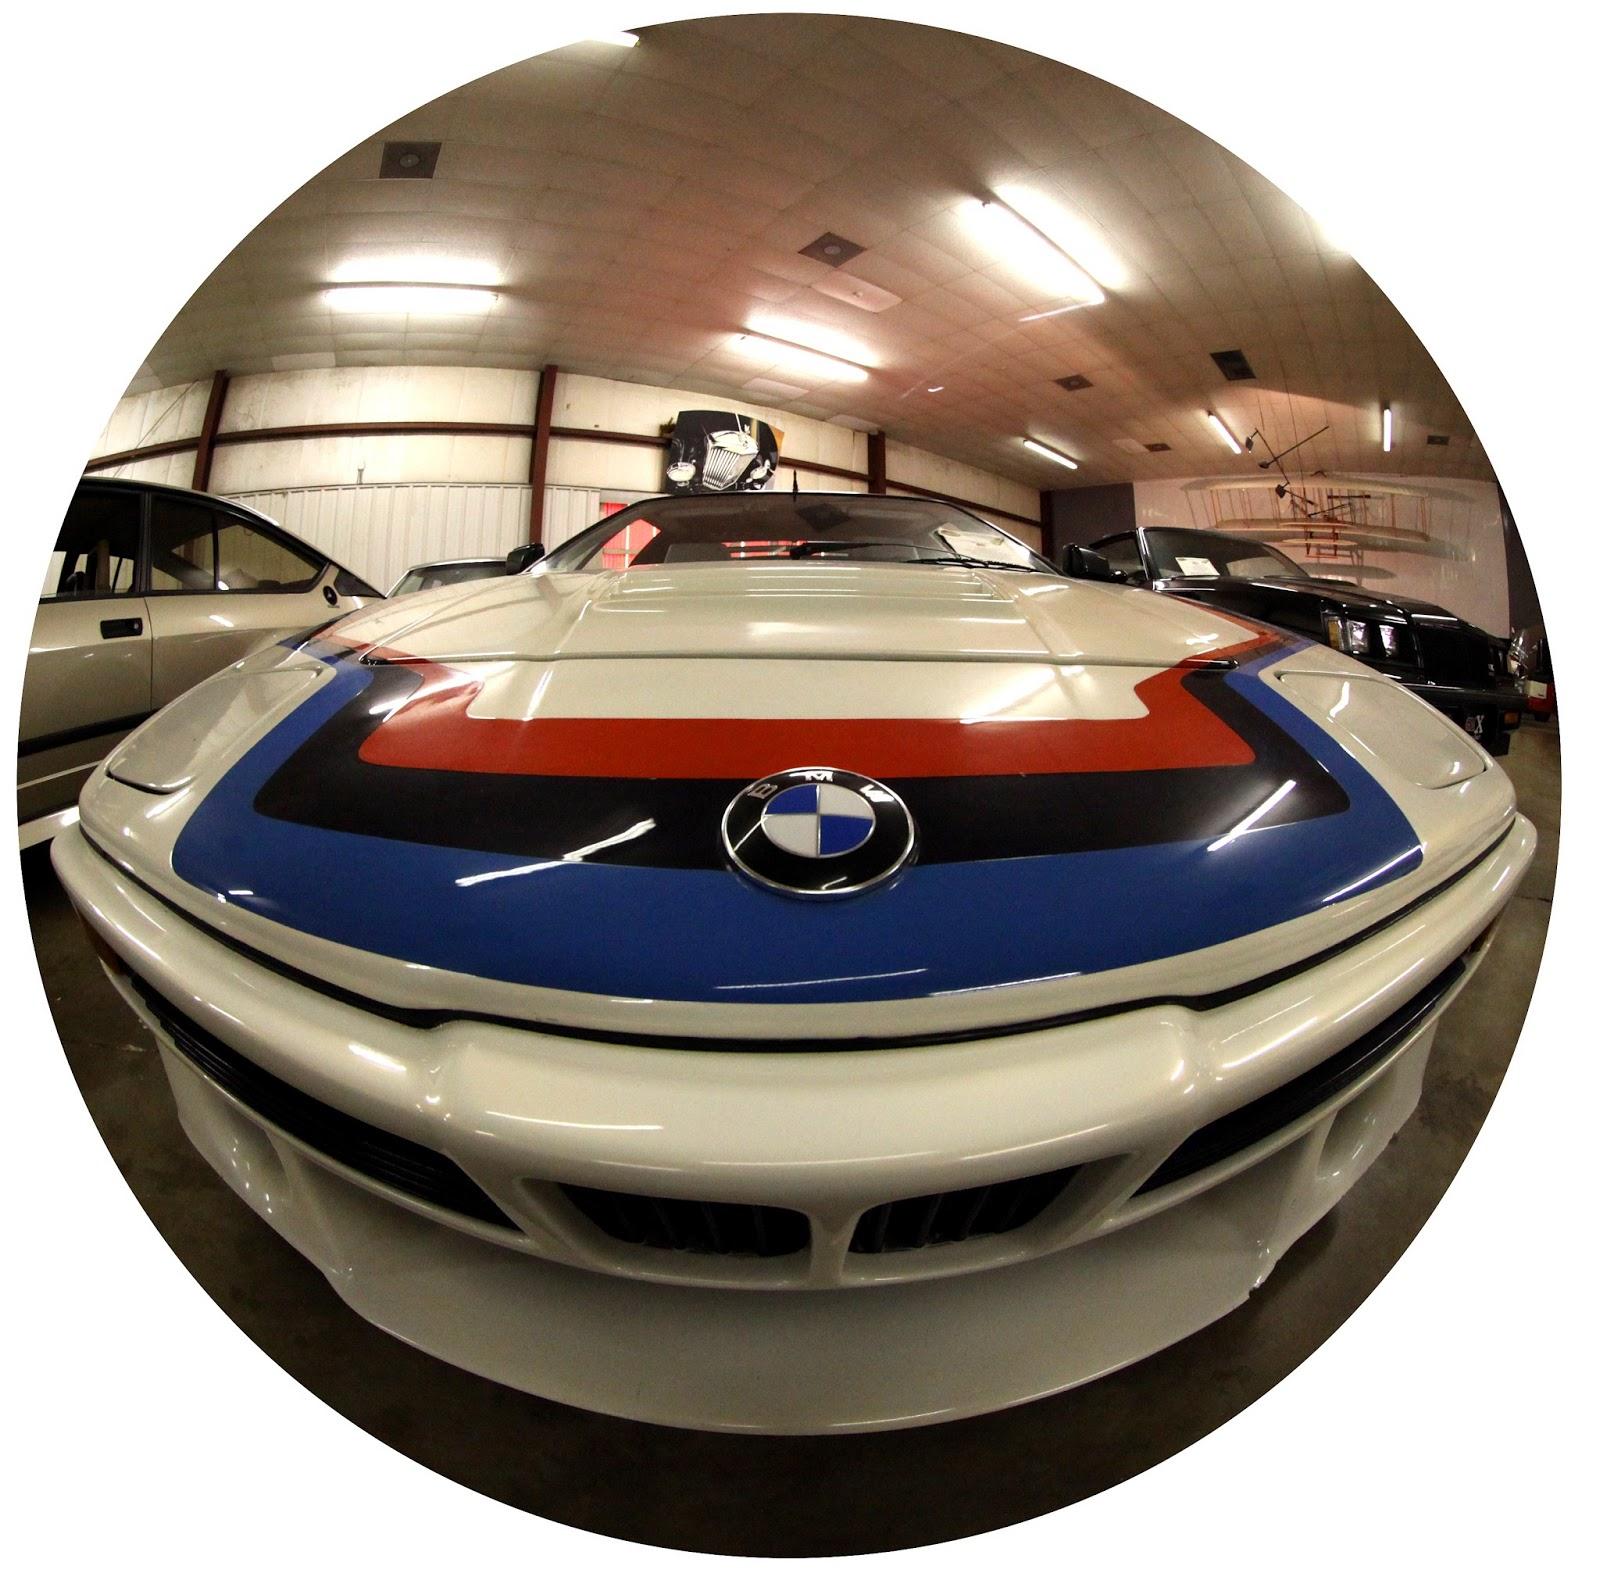 FISHEYE FOR THE PHOTO GUY: Sarasota Classic Car Museum